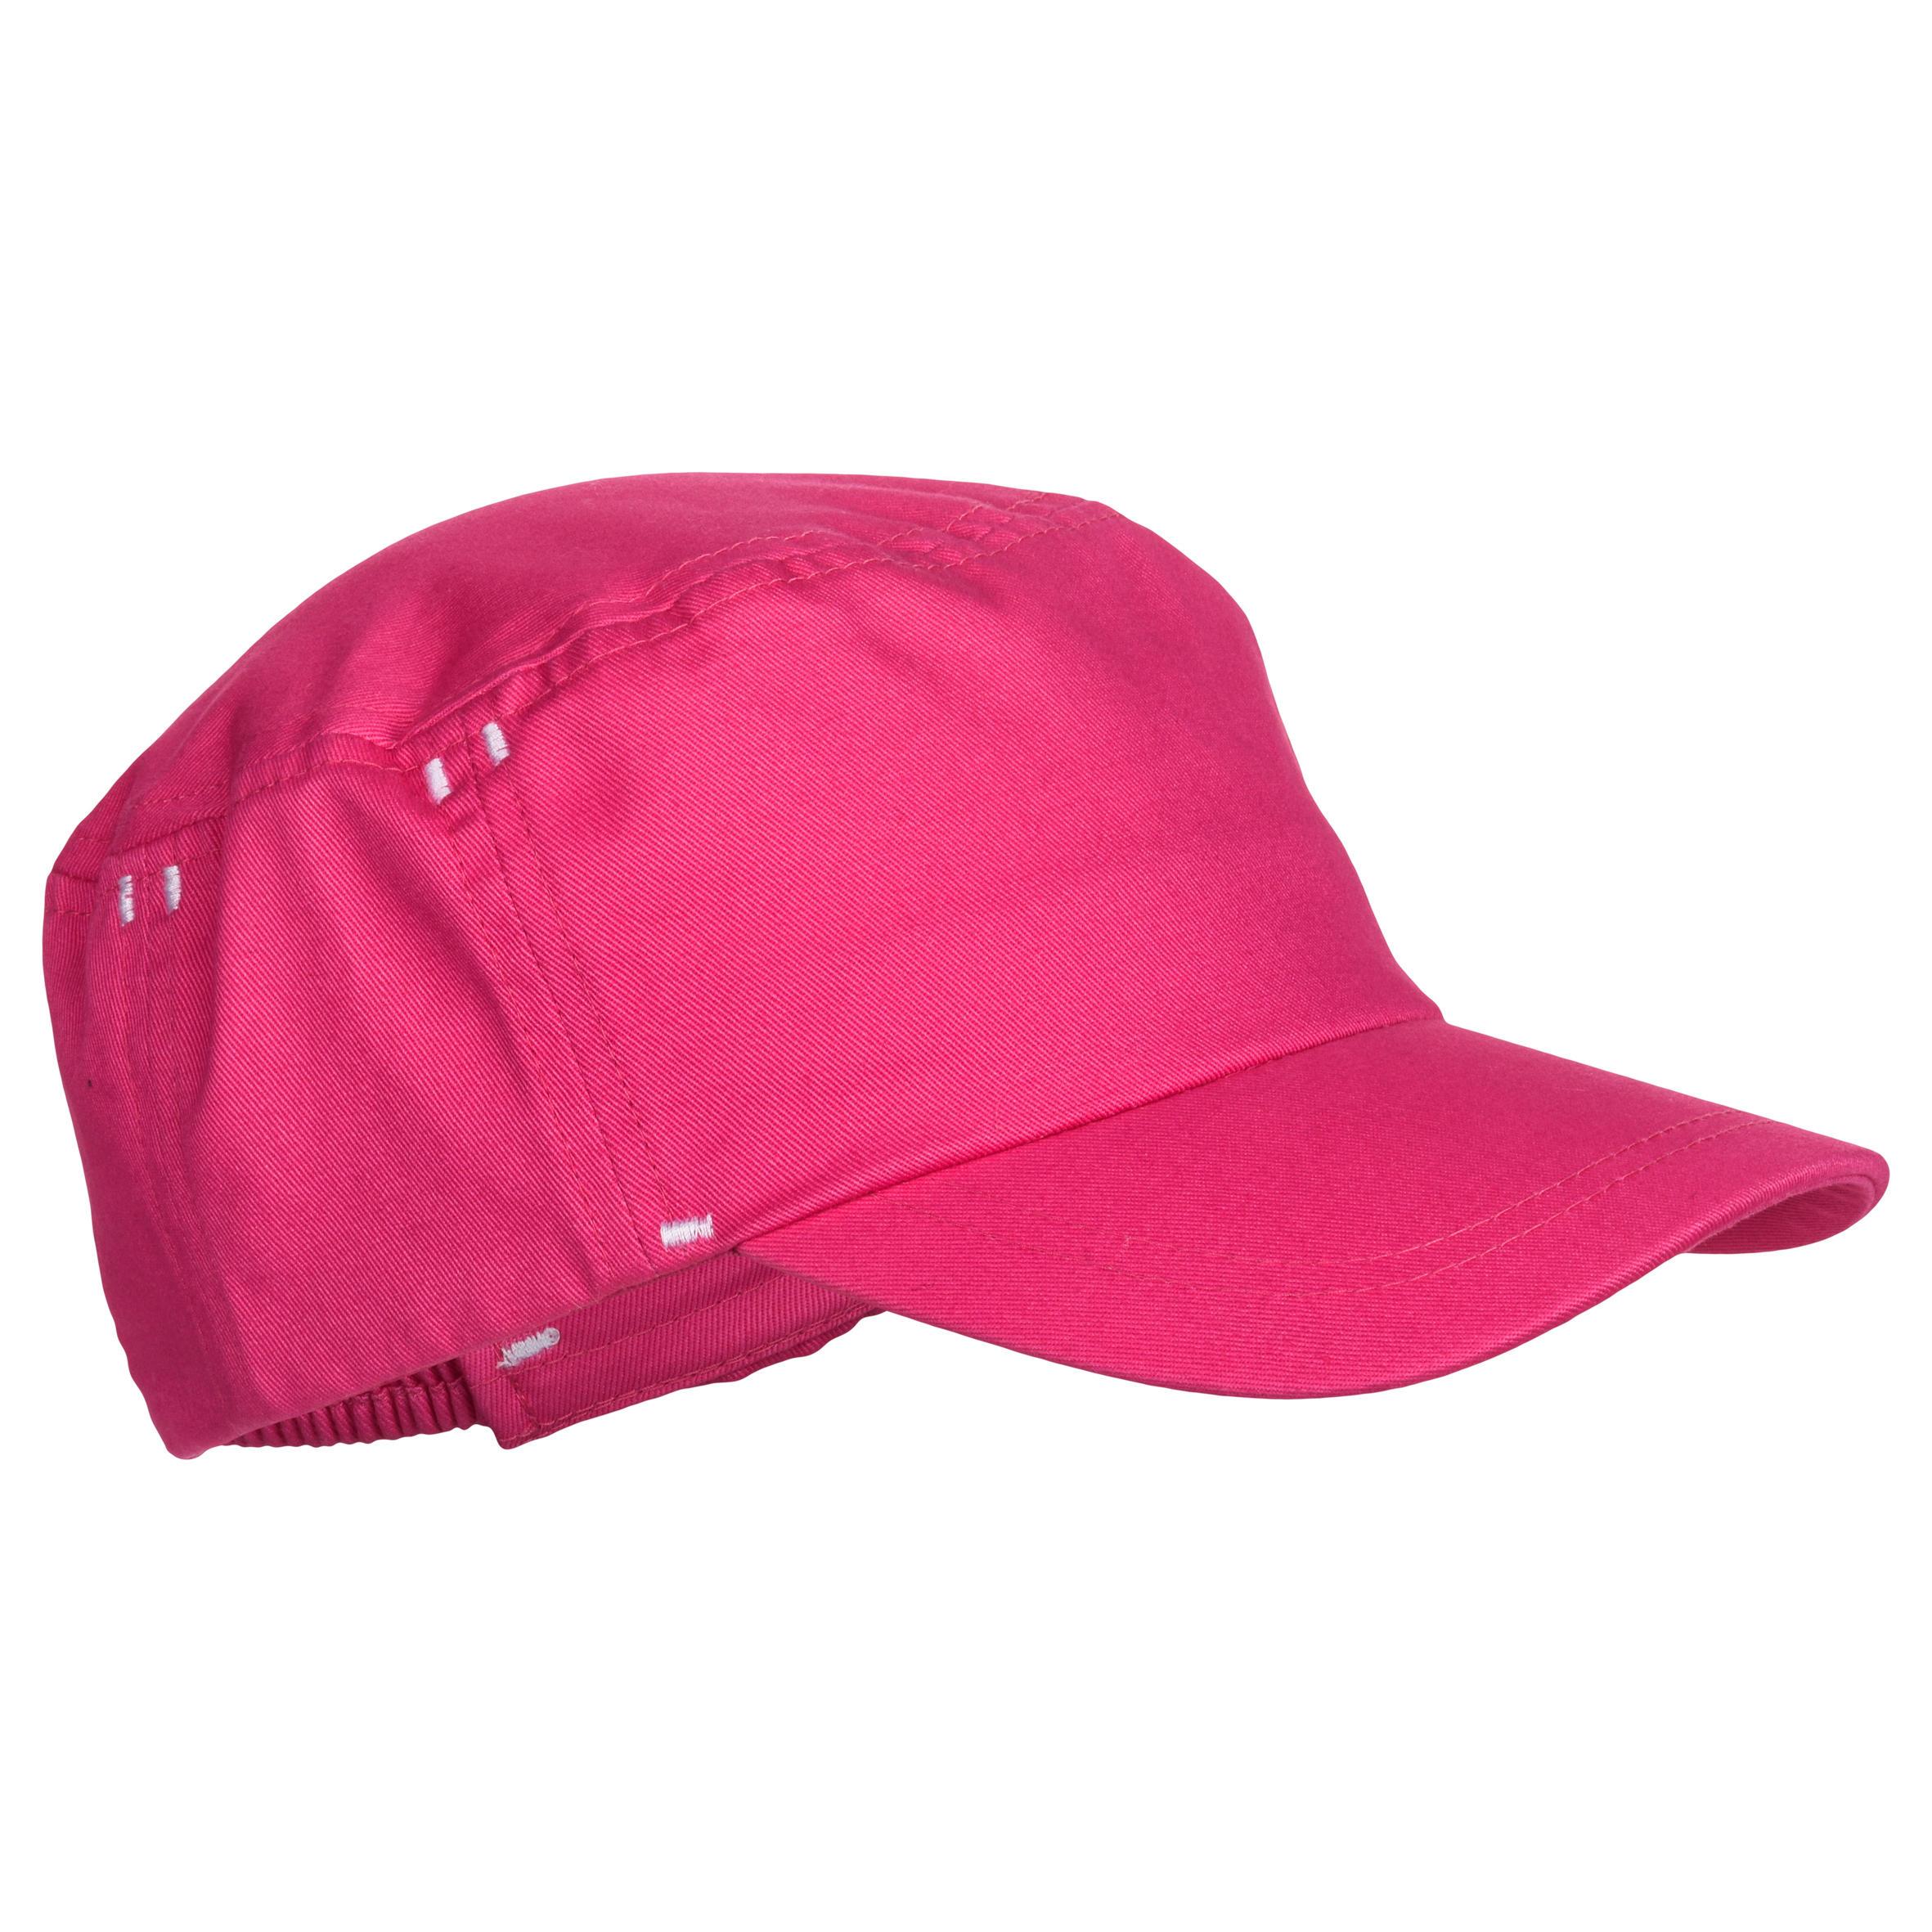 500 Baby Gym Cap - Pink Print